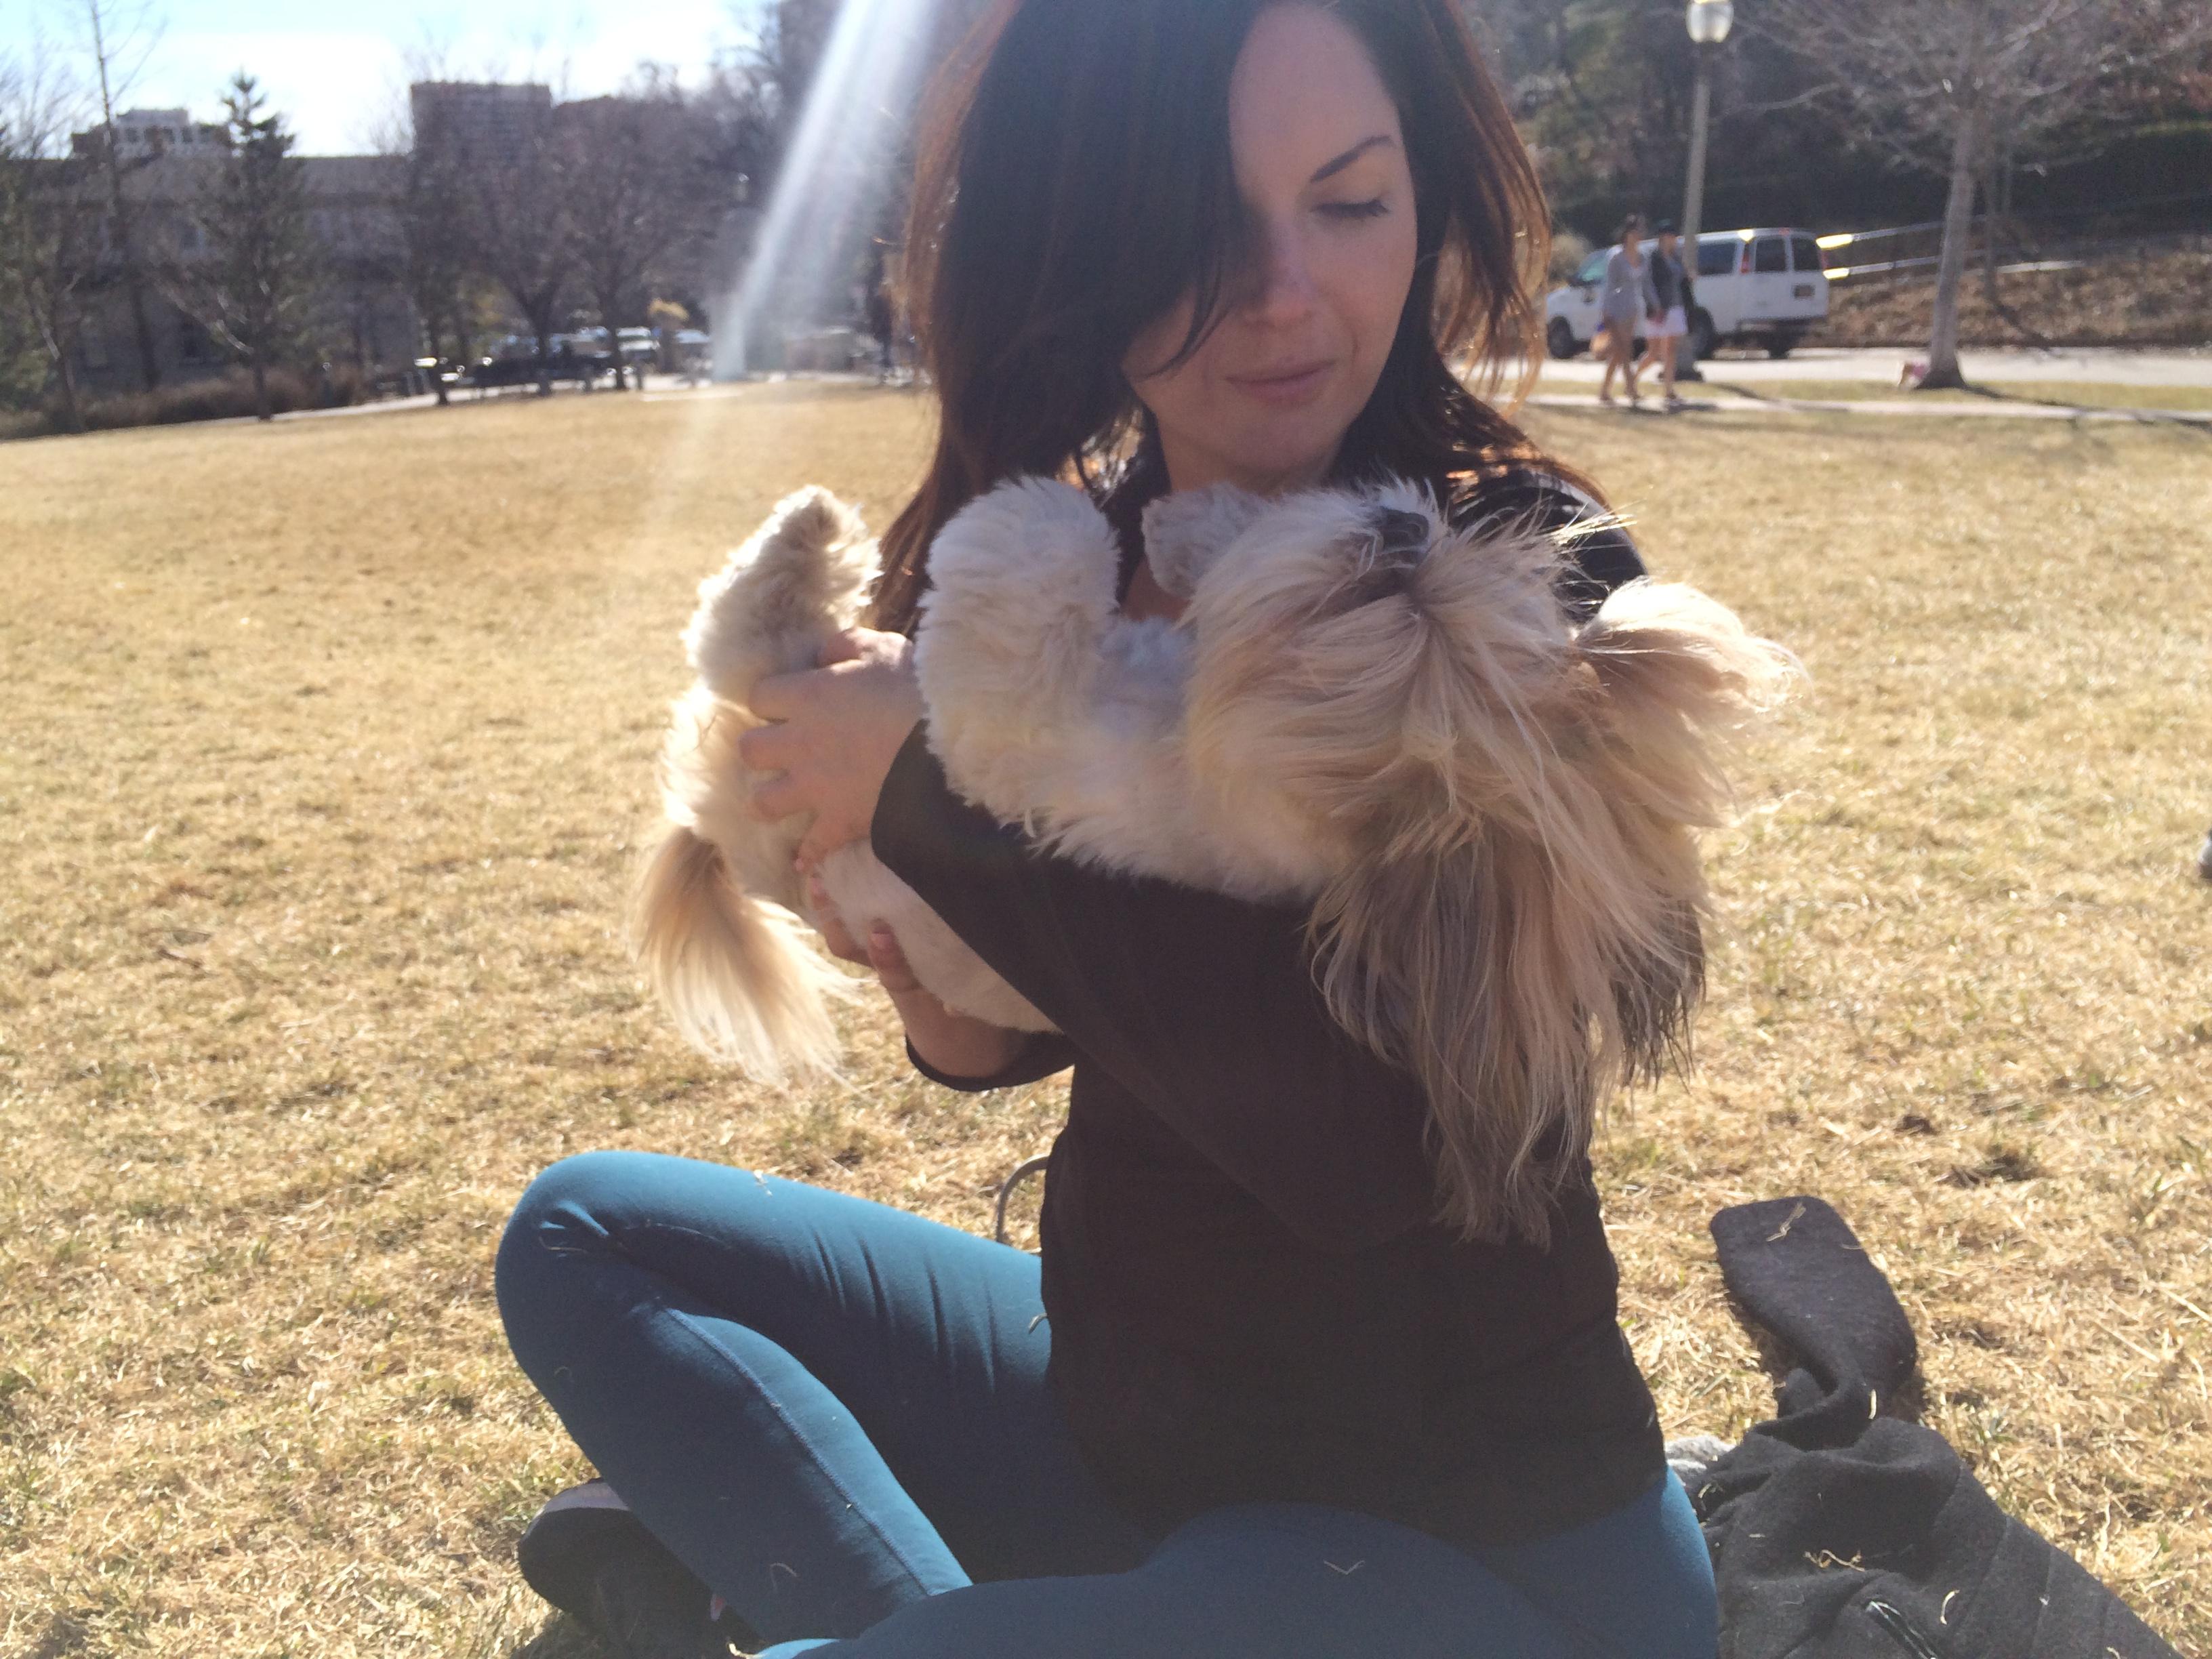 My no. 1 pup. Feb 28, 2016 919